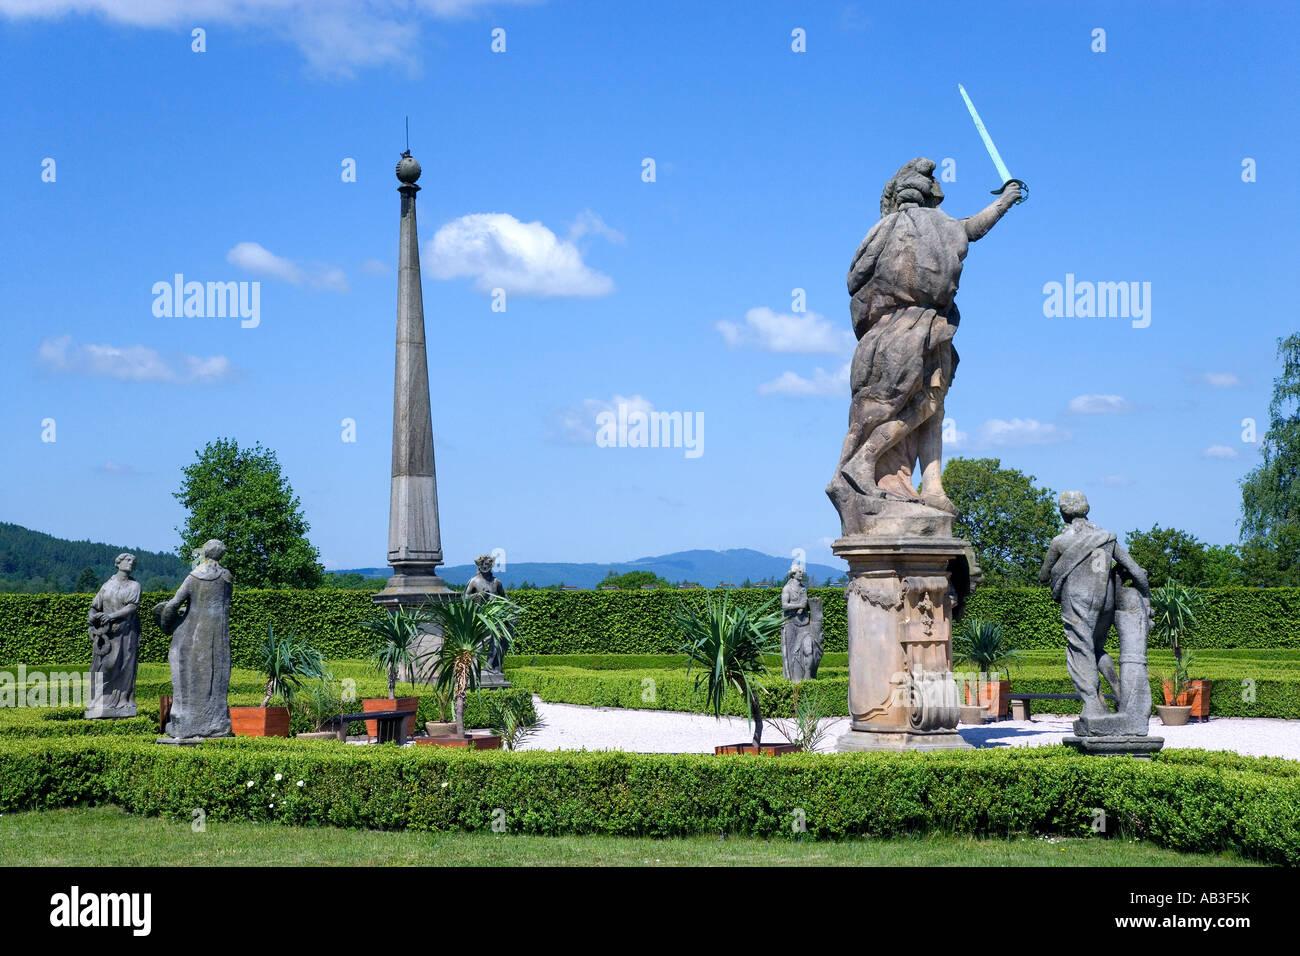 nar kulturni pamatka Kuks barokni spital 1692 G B Alliprandi sochy M B Braun Ceska republi - Stock Image